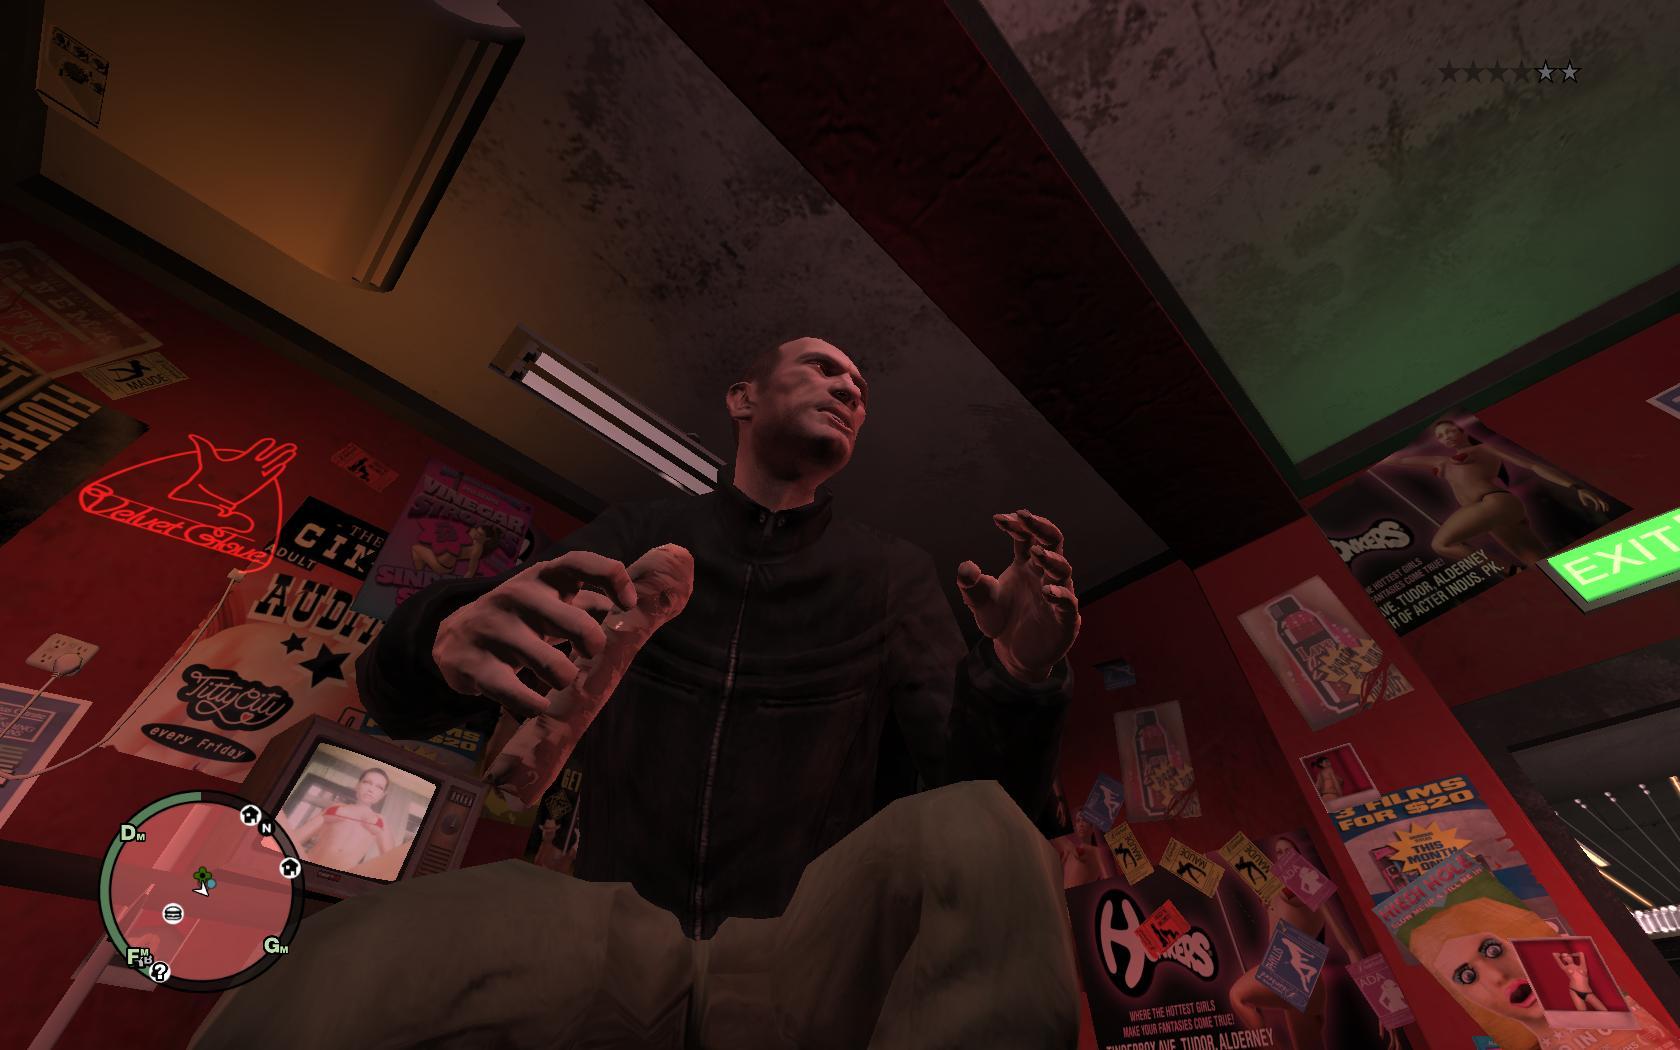 ХУЙ - Grand Theft Auto 4